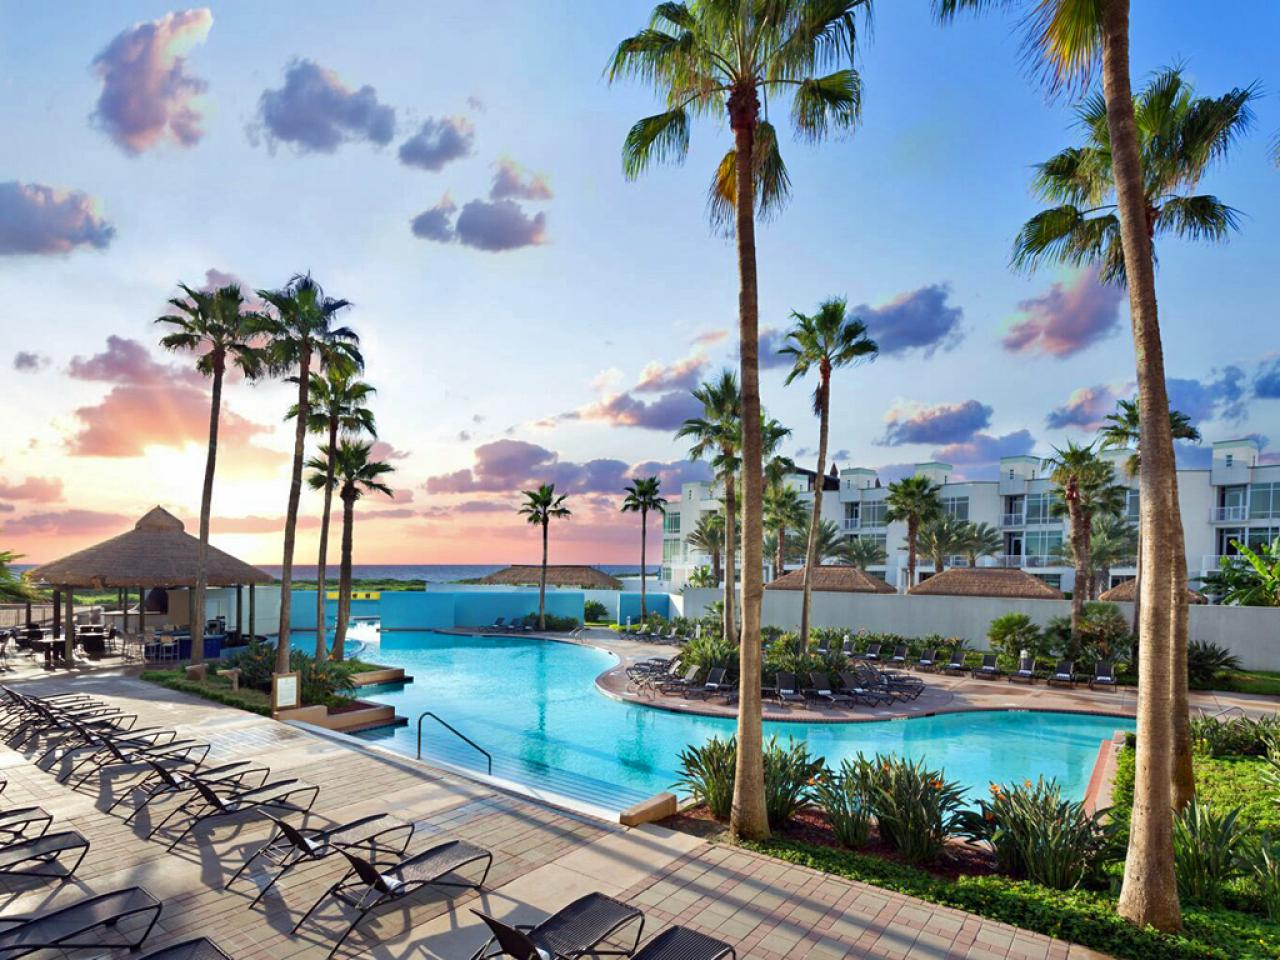 Best Resort In South Padre Island Tx